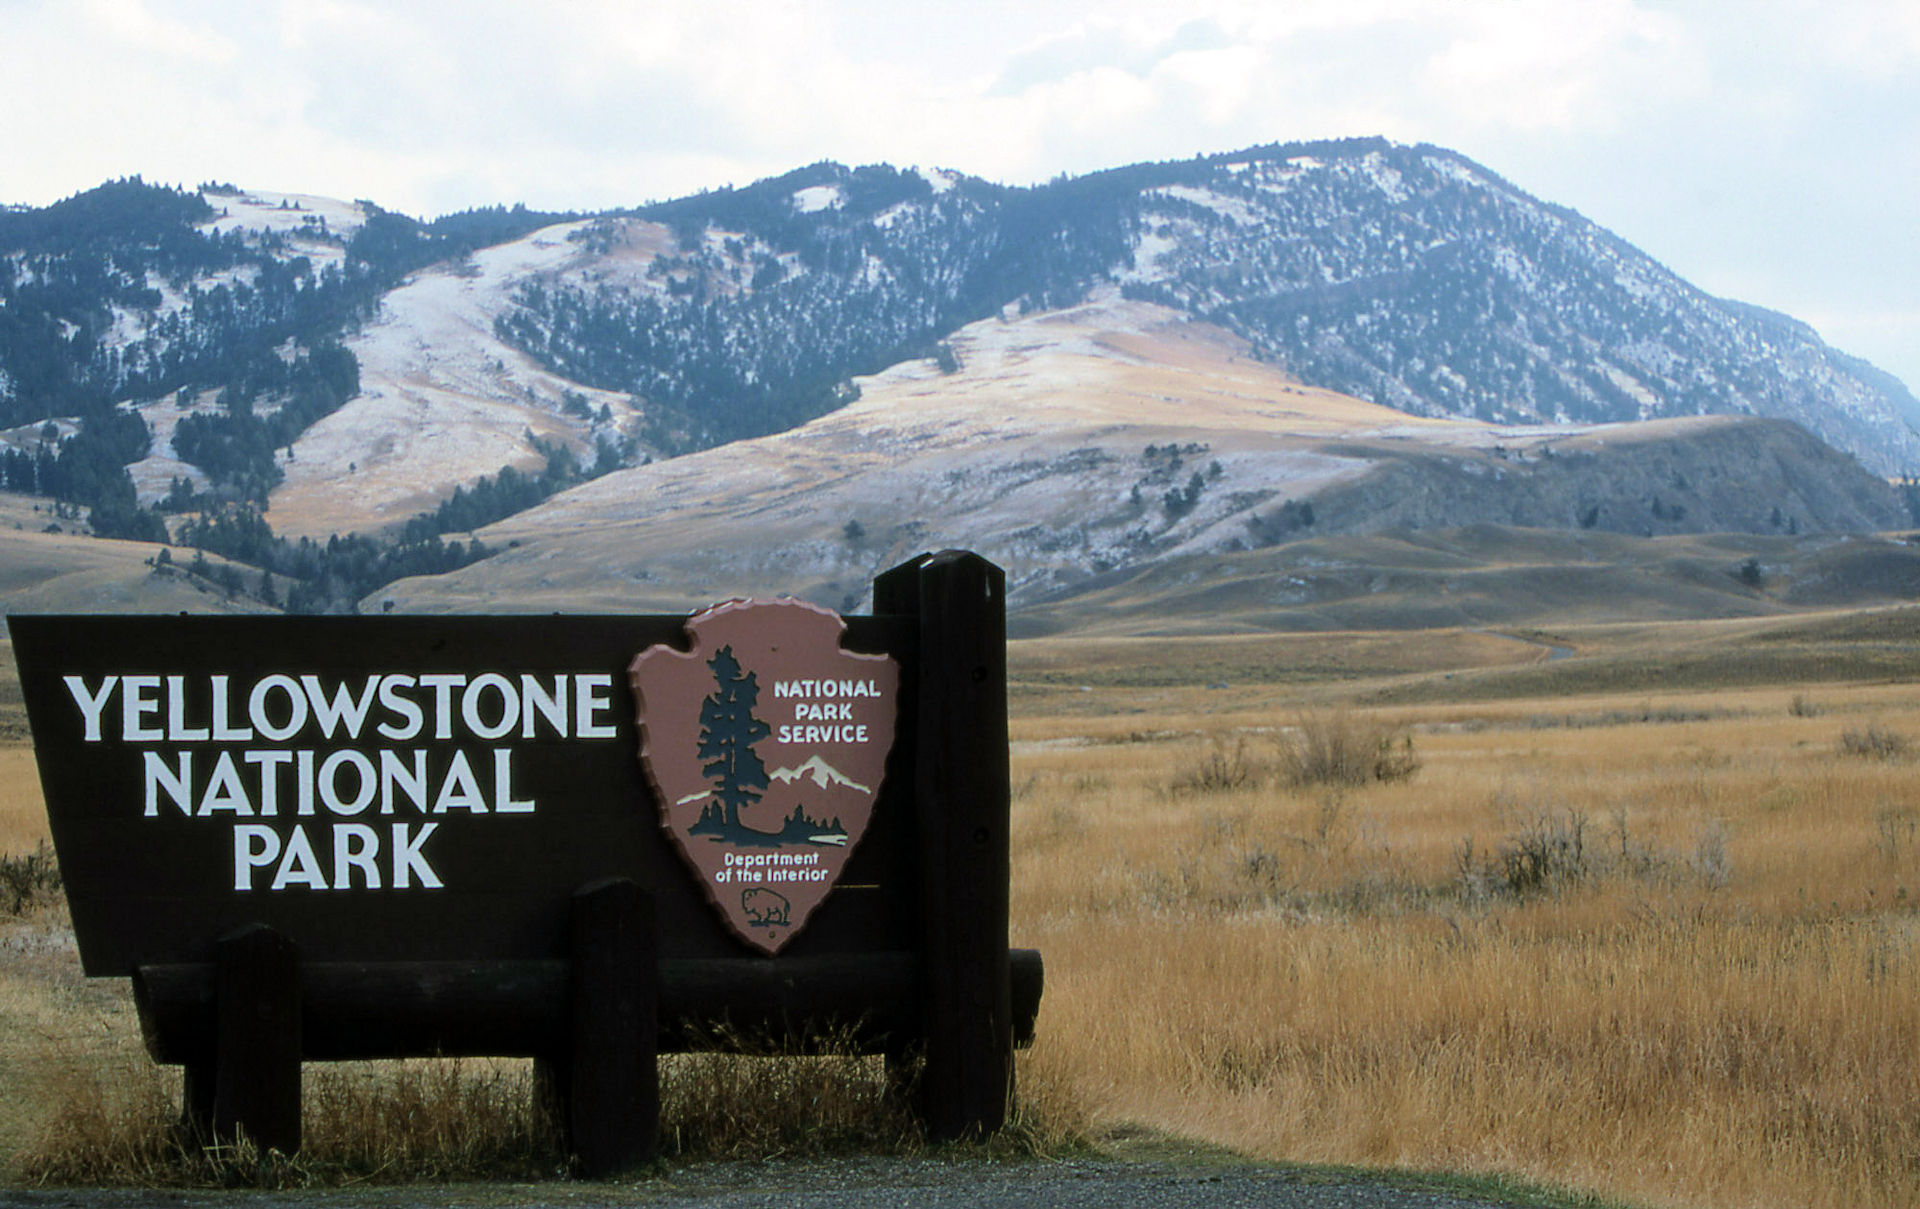 Yellowstone National Park sign at the North Entrance - Jim Peaco, NPS, October 1992